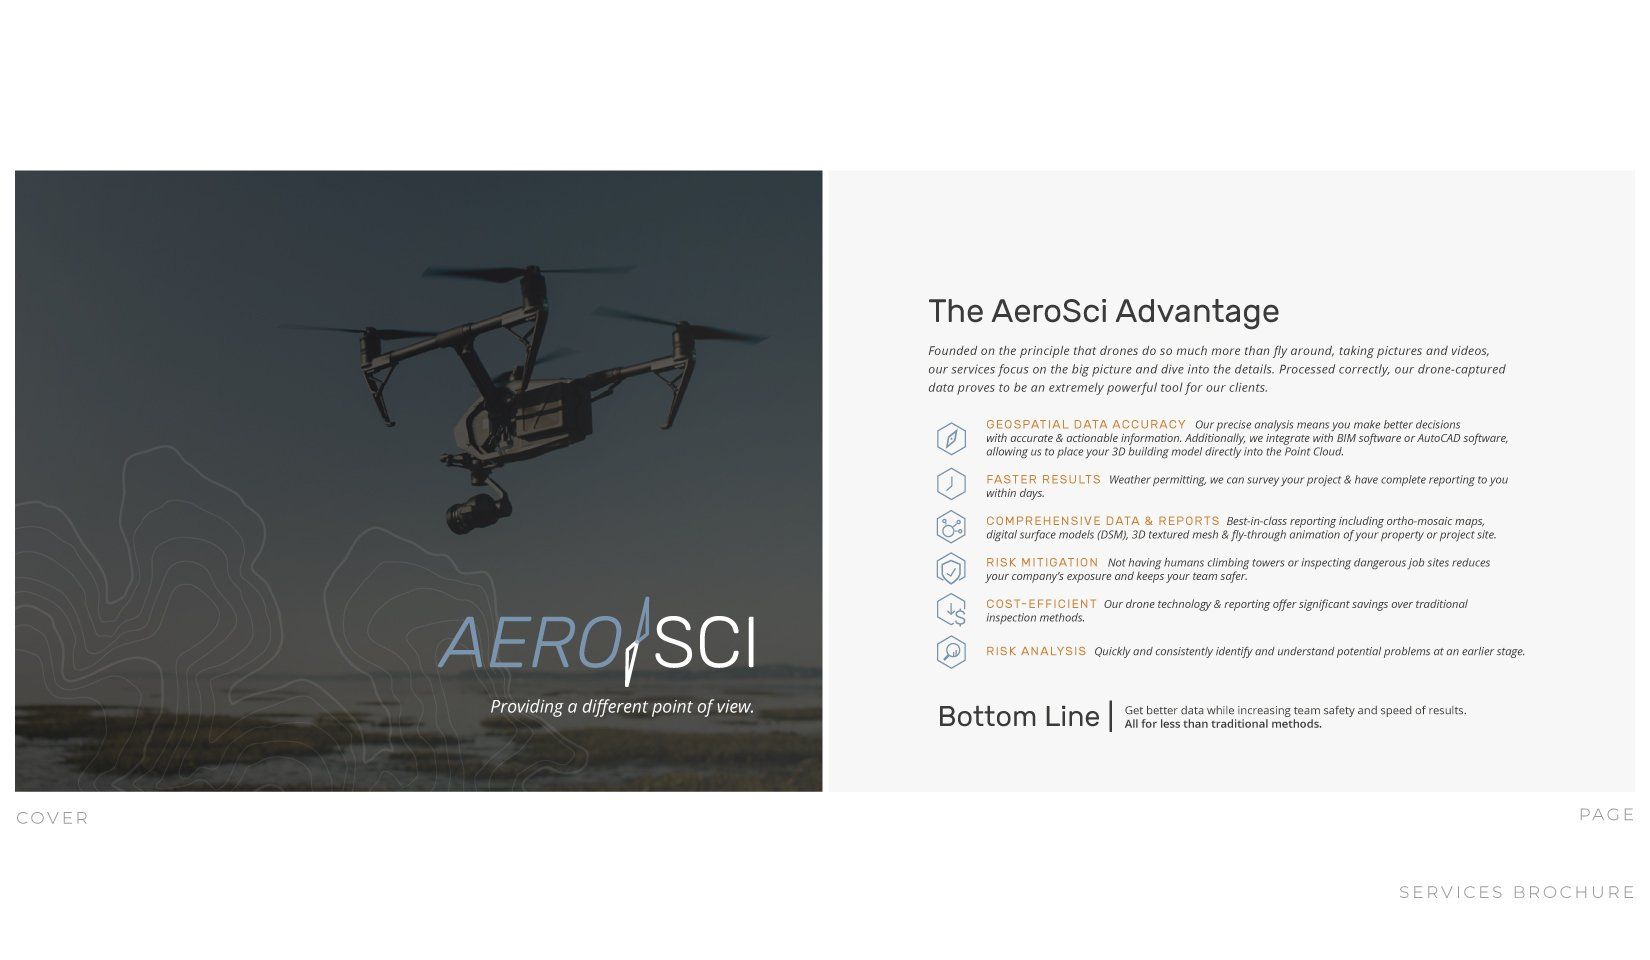 Client Portfolio | AeroSci Branding Services Brochure